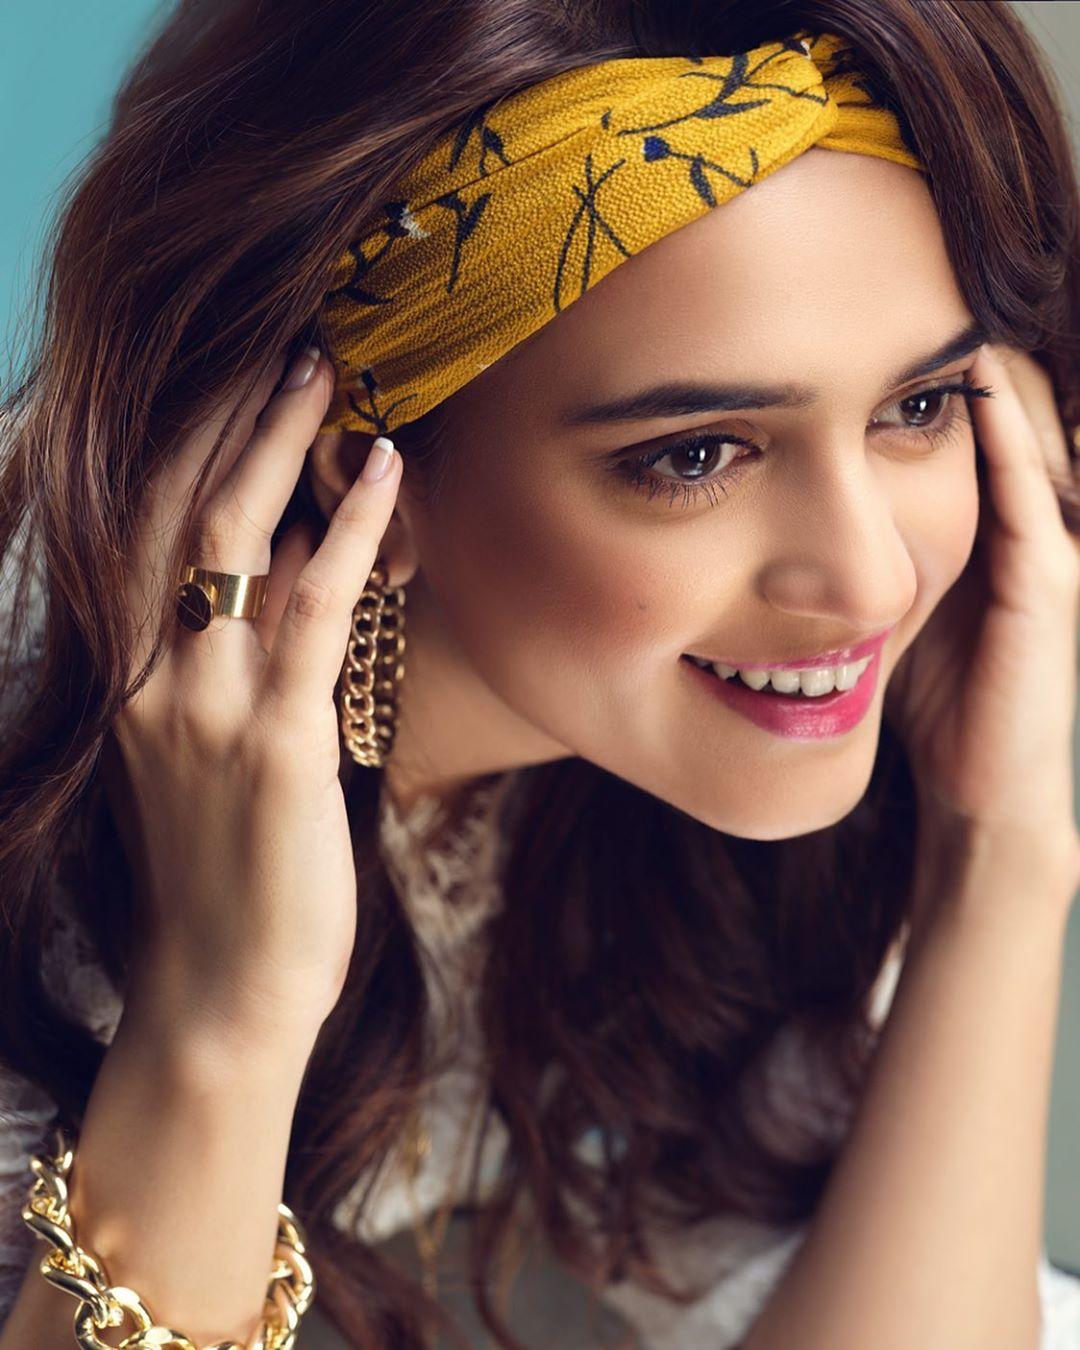 Awesome Clicks of Actress Sumbul Iqbal frim Recent Photo shoot